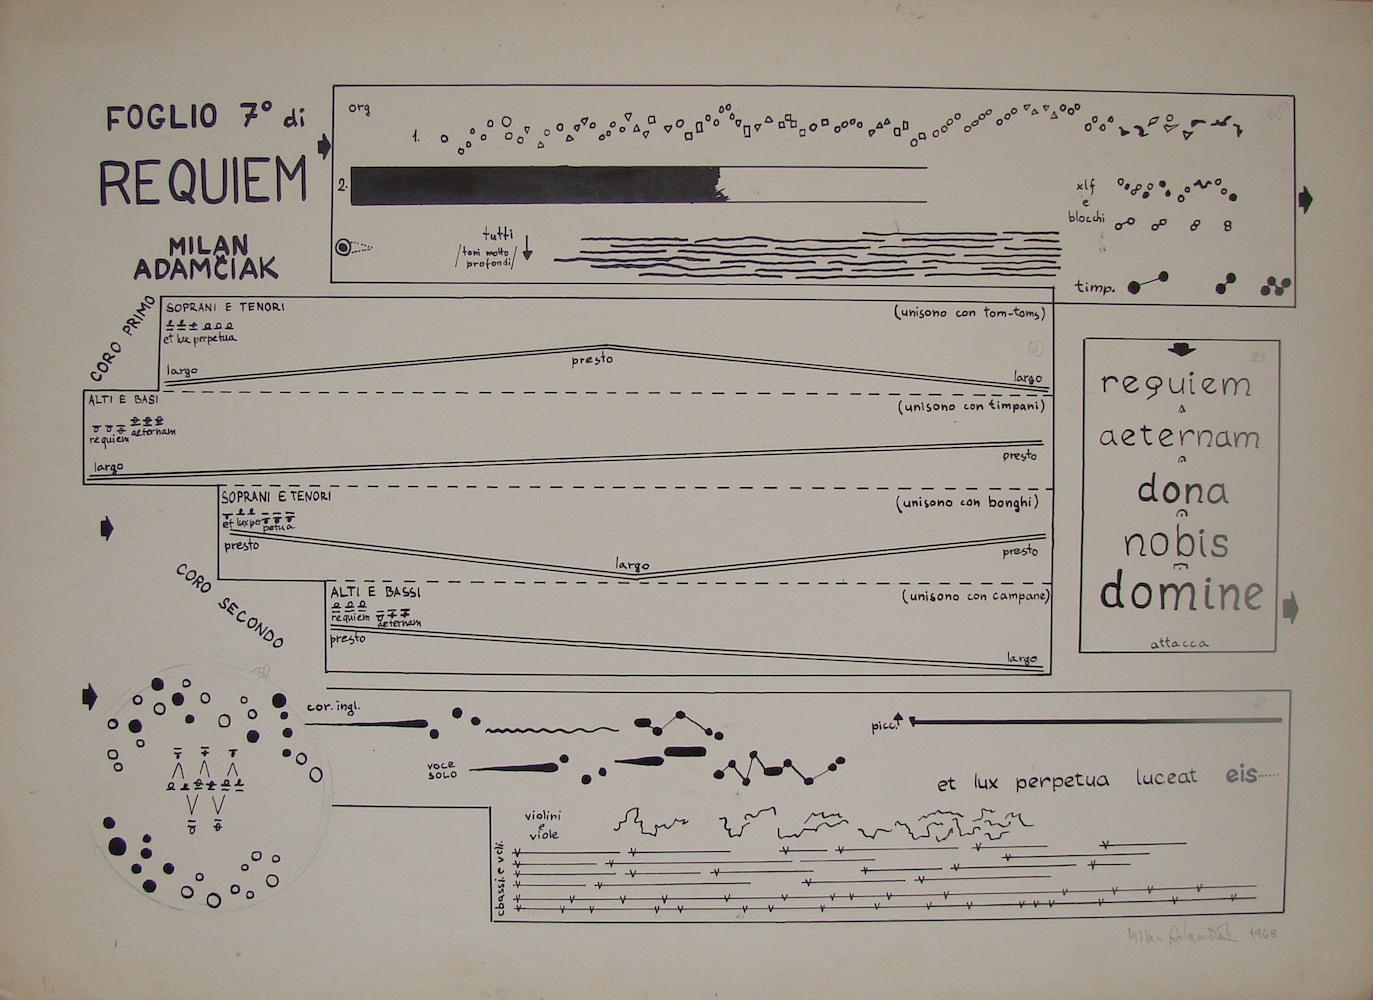 1968, Foglio 7 di Requiem, tuš na papieri, 33x45 cm